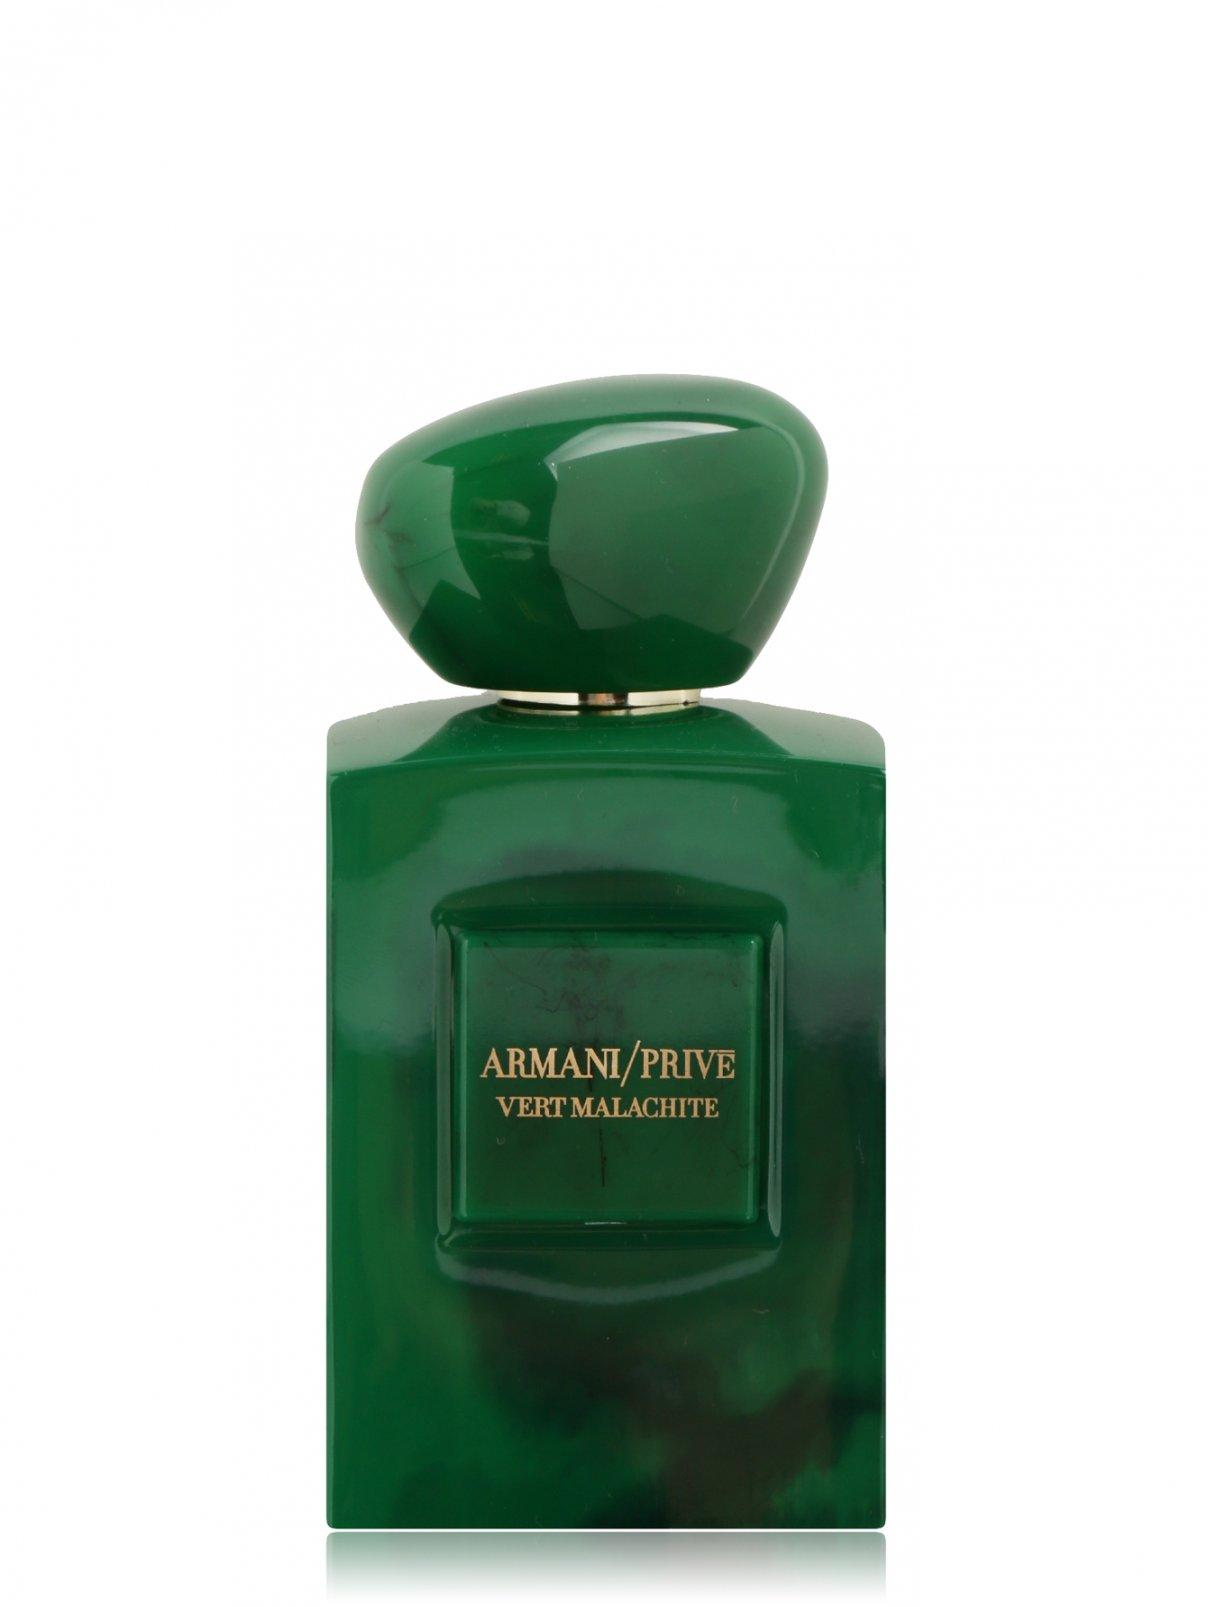 Парфюмерная вода 50 мл Armani/Prive Vert Malachite Giorgio Armani  –  Общий вид